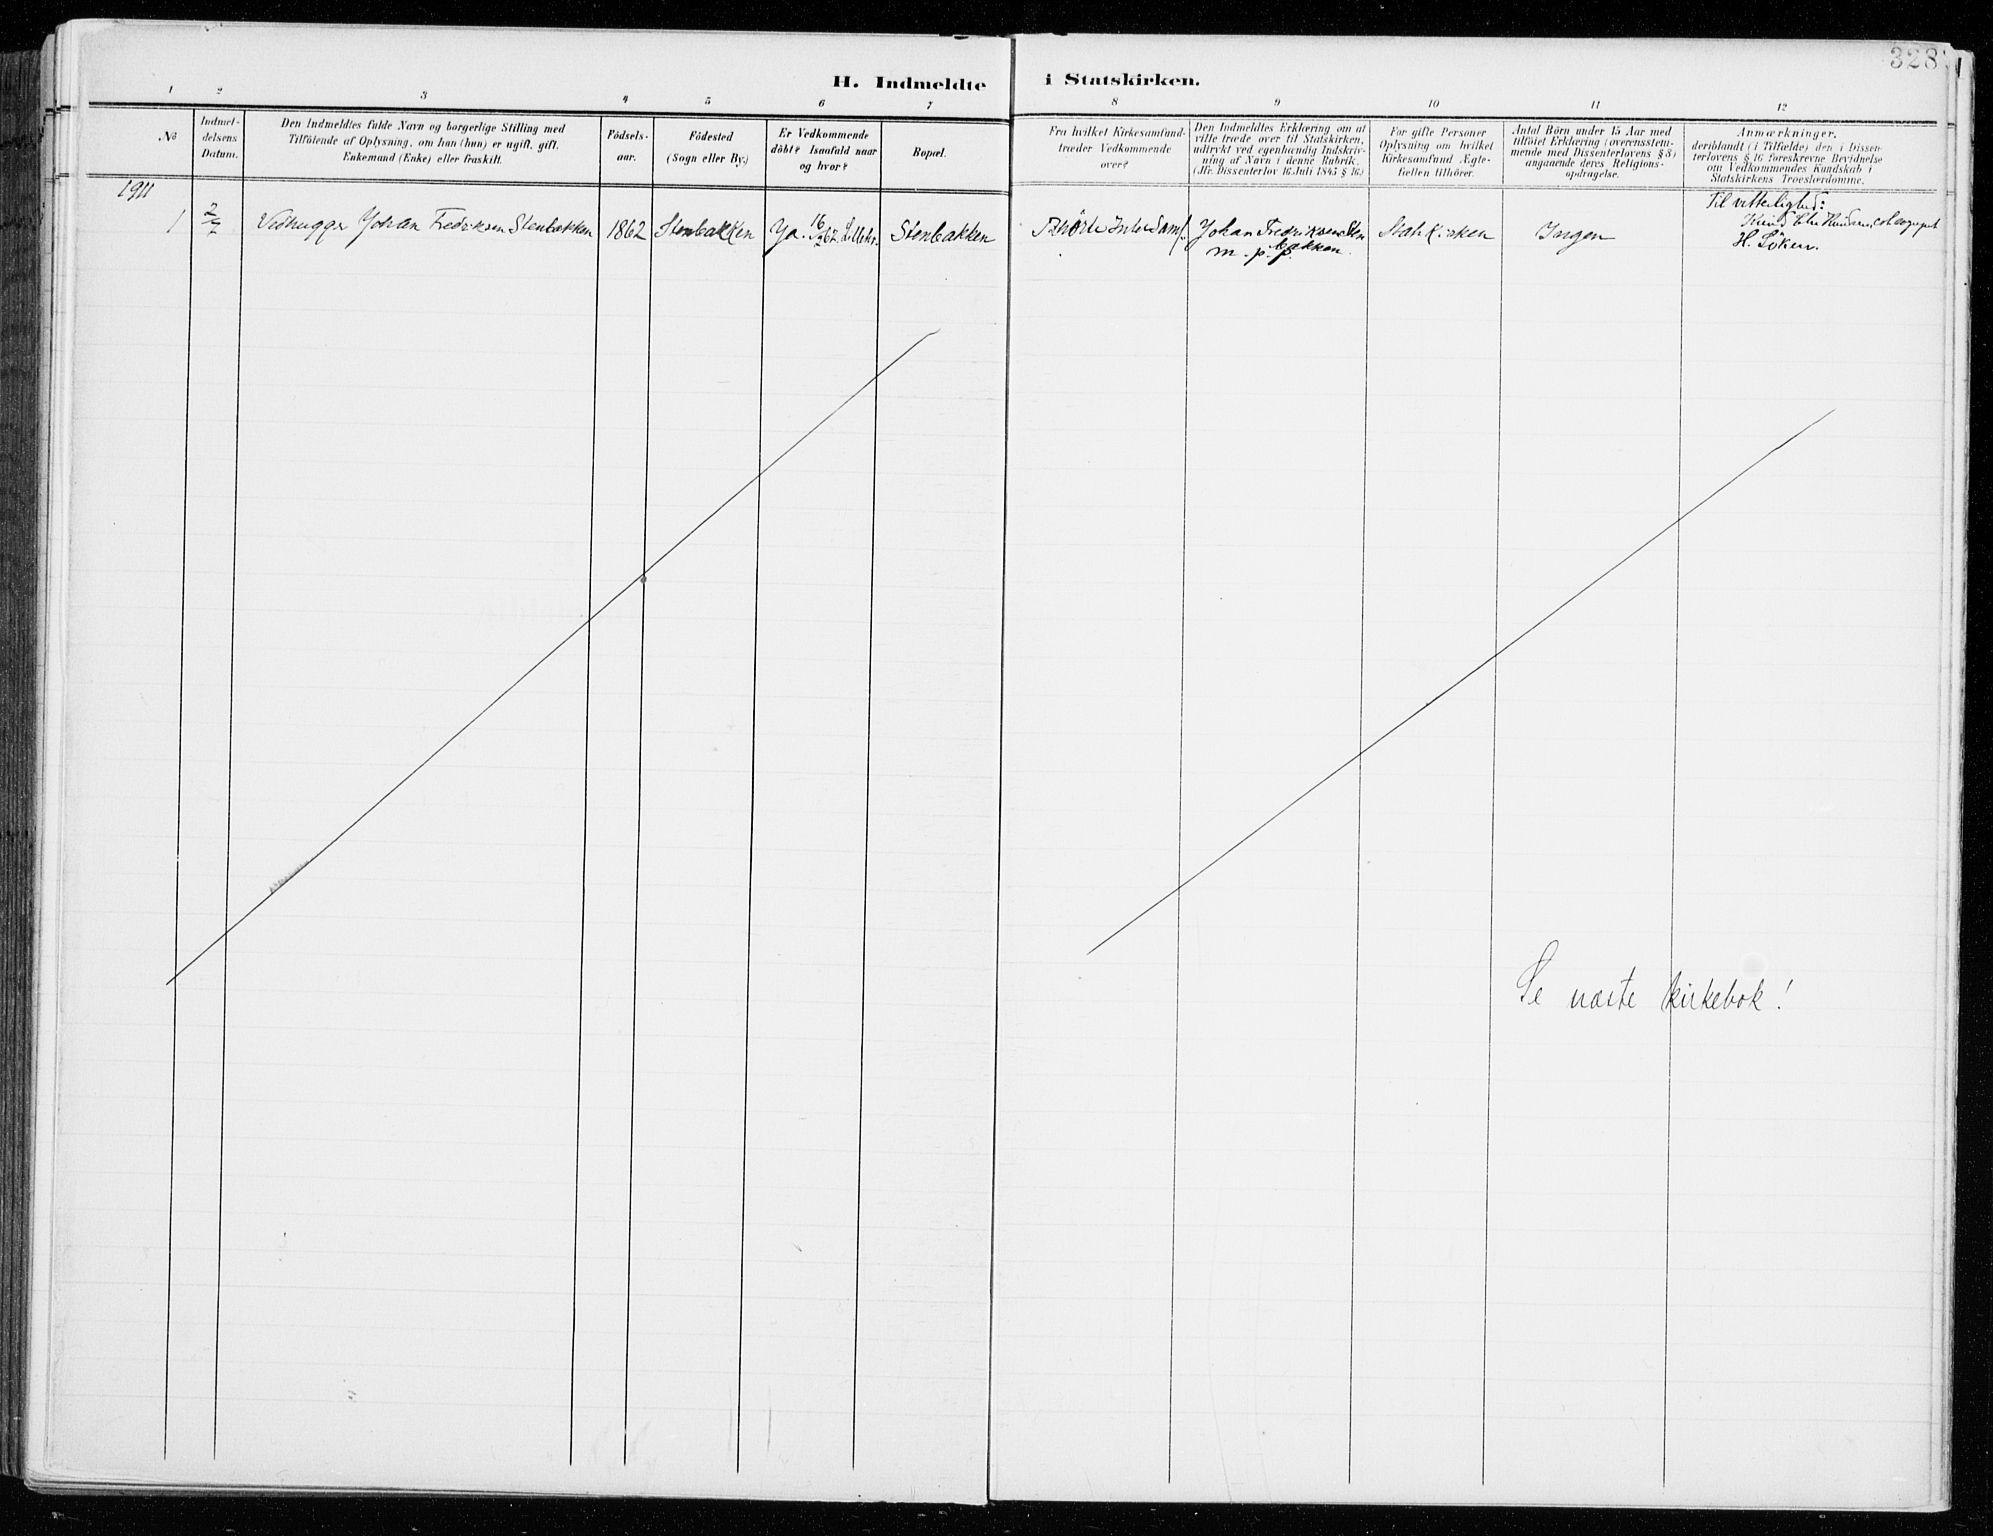 SAH, Fåberg prestekontor, H/Ha/Haa/L0011: Ministerialbok nr. 11, 1899-1913, s. 328